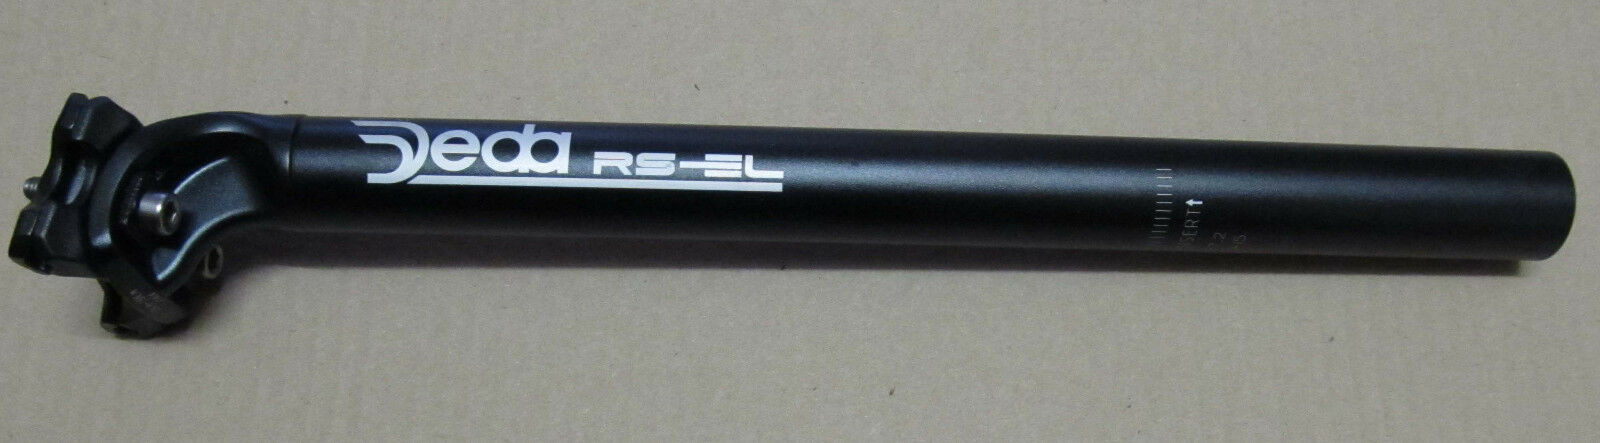 Deda Elementi RS EL Alu Sattelstütze MTB Rennrad Singlespeed  27,2mm 350mm 295gr.  online sale